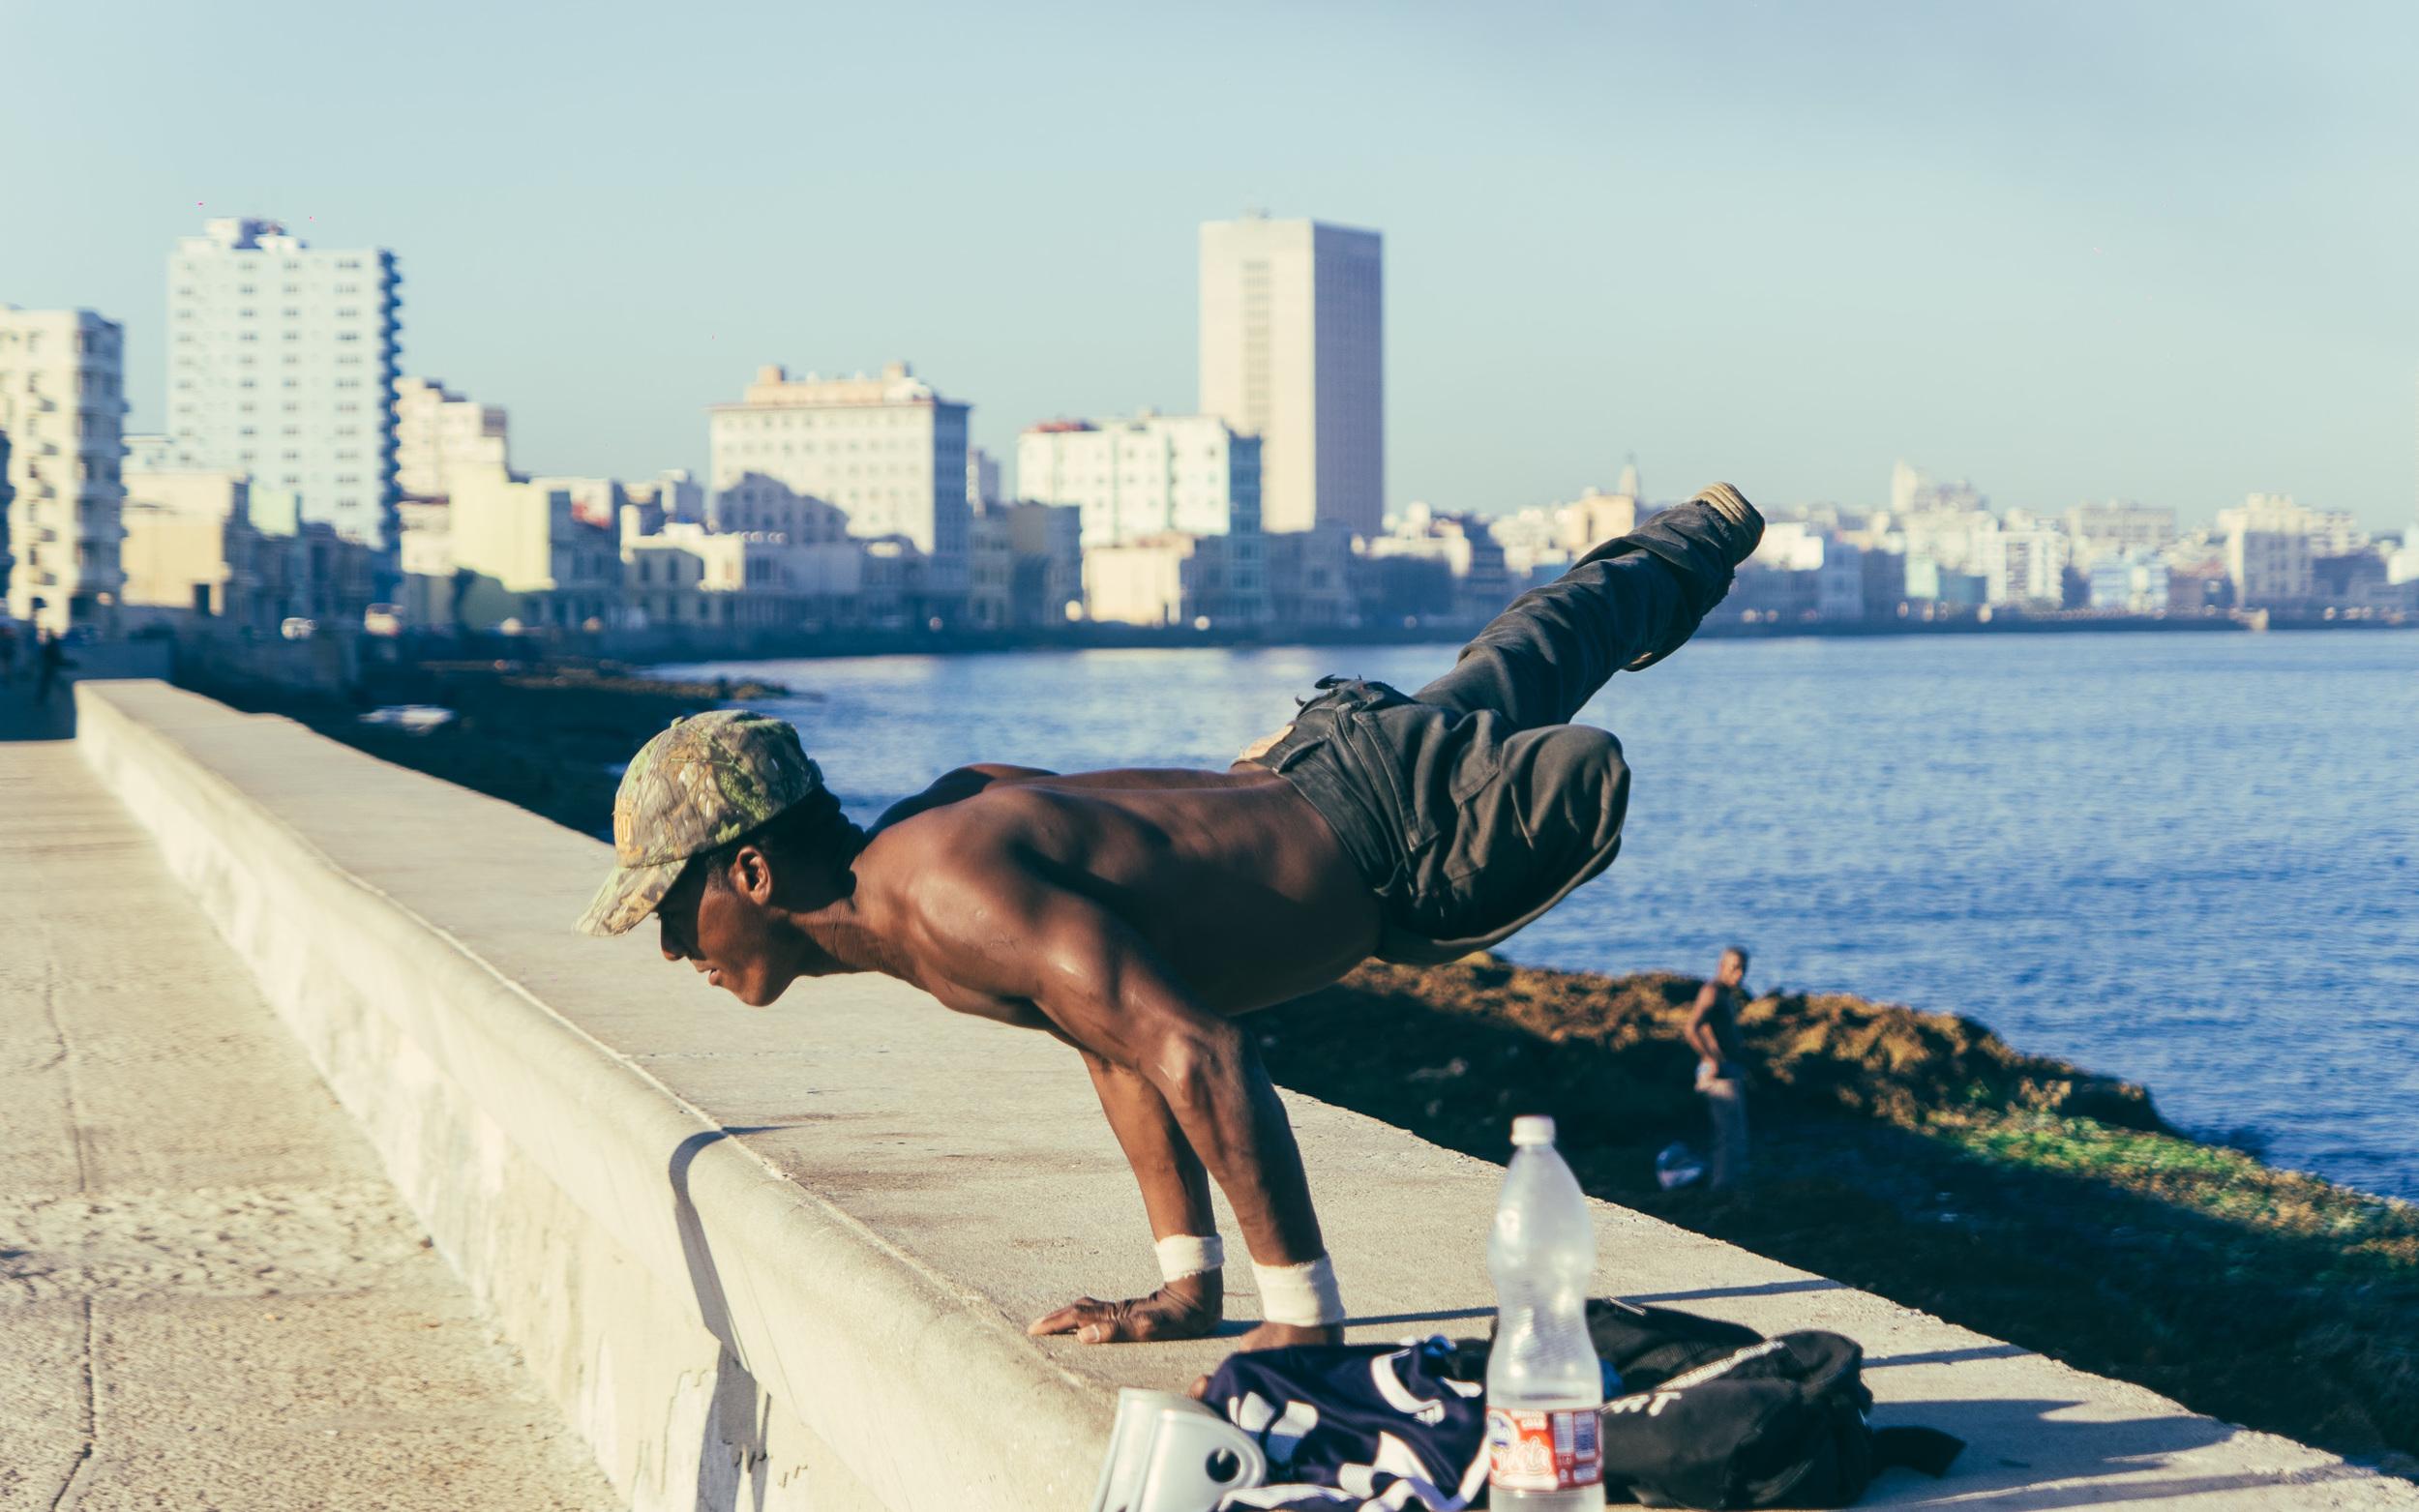 DeClaro-Photography-Cuba-02684.jpg